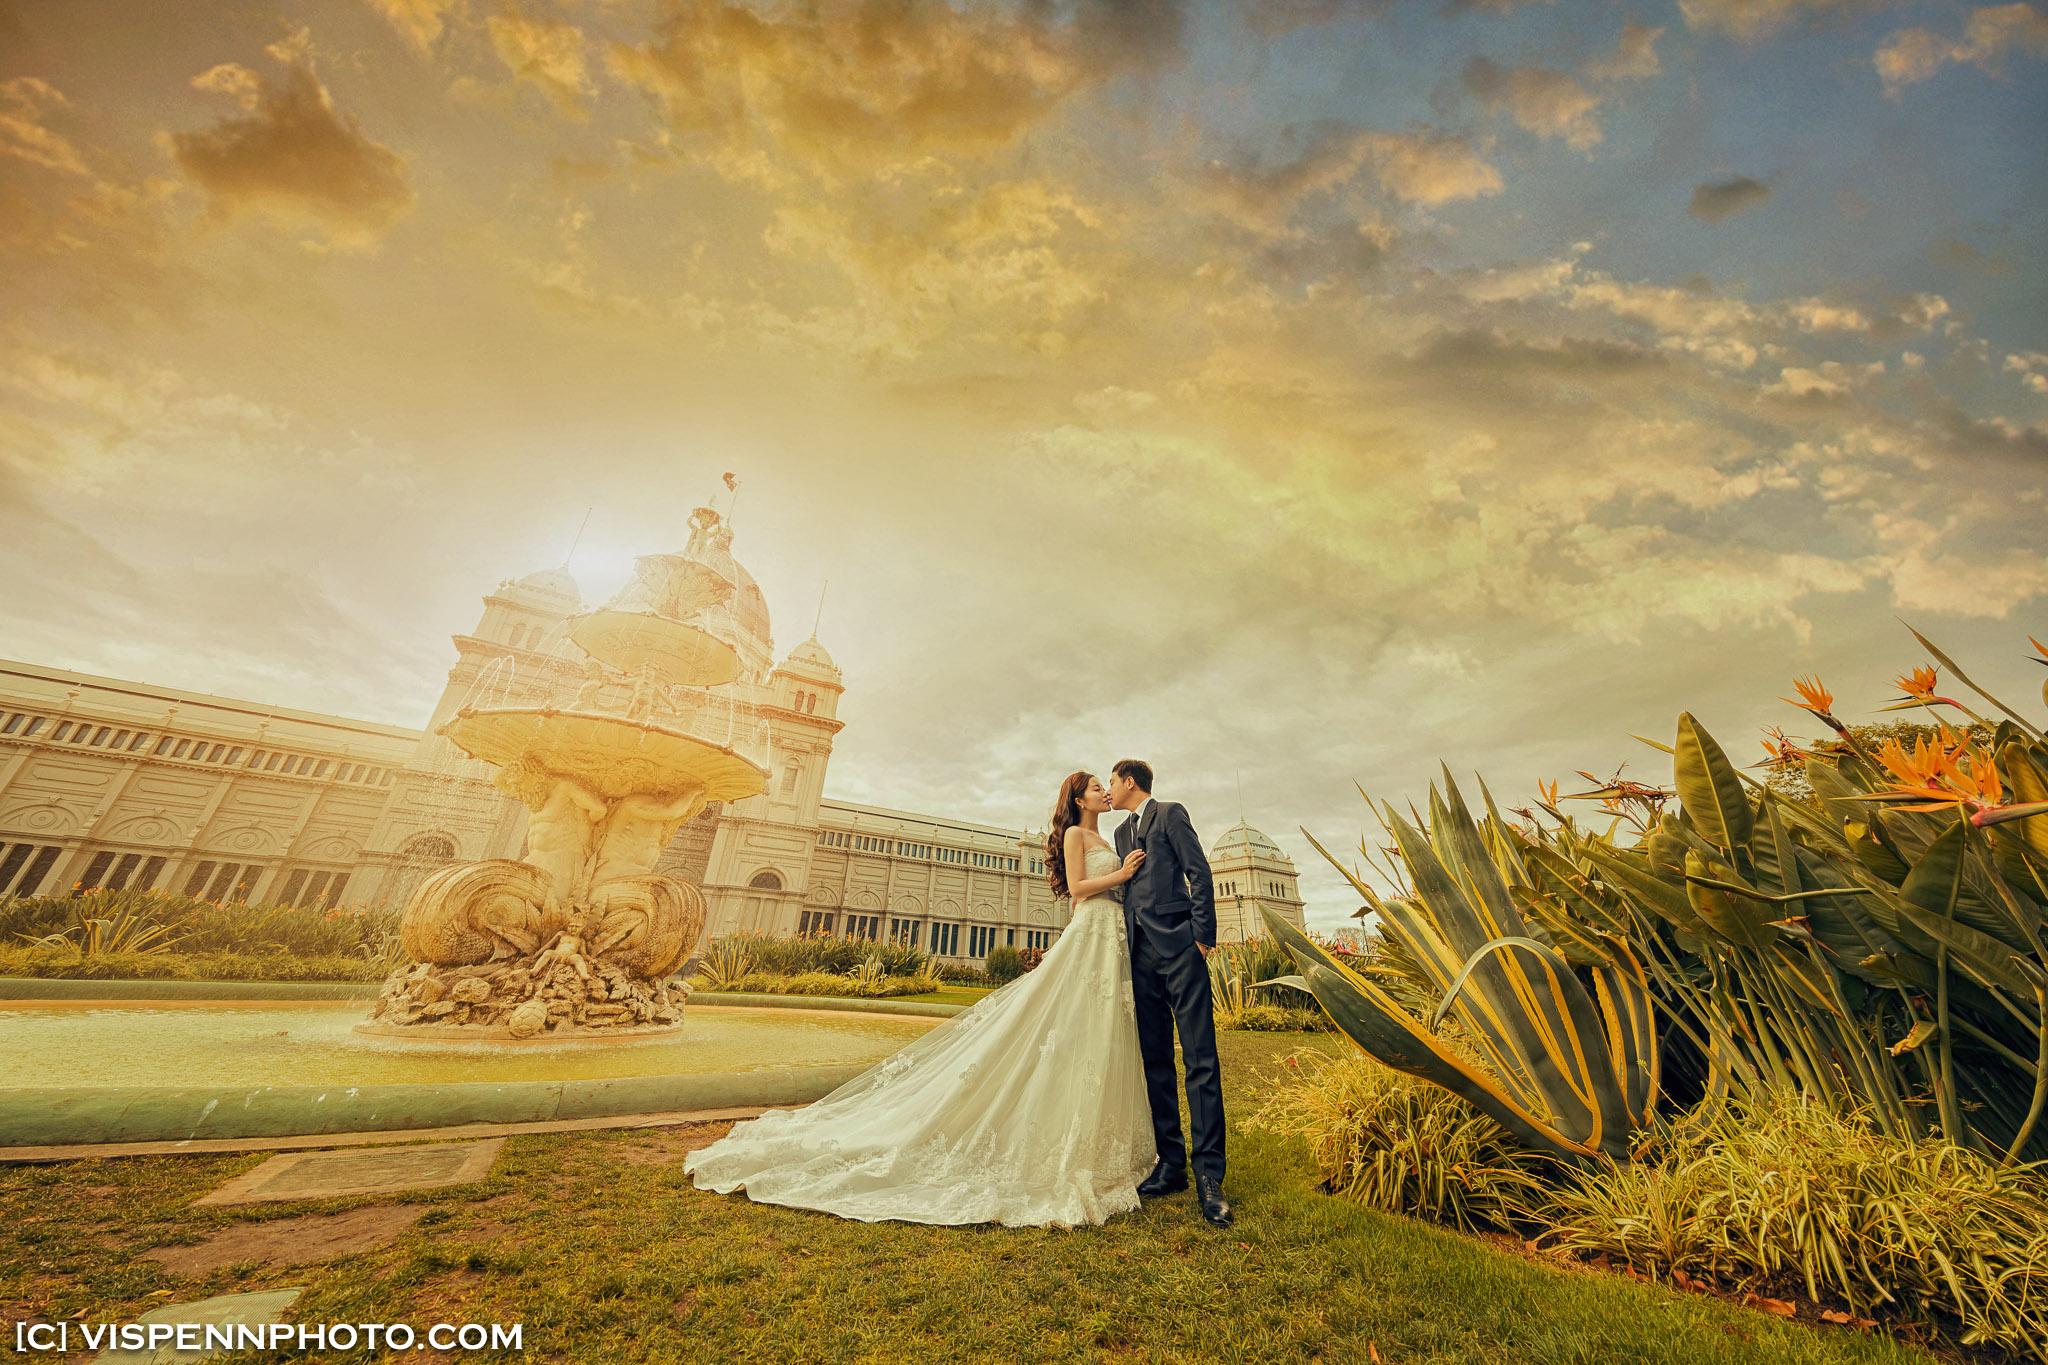 PRE WEDDING Photography Melbourne VISPENN 墨尔本 婚纱照 结婚照 婚纱摄影 VISPENN JackySerena 1438 1